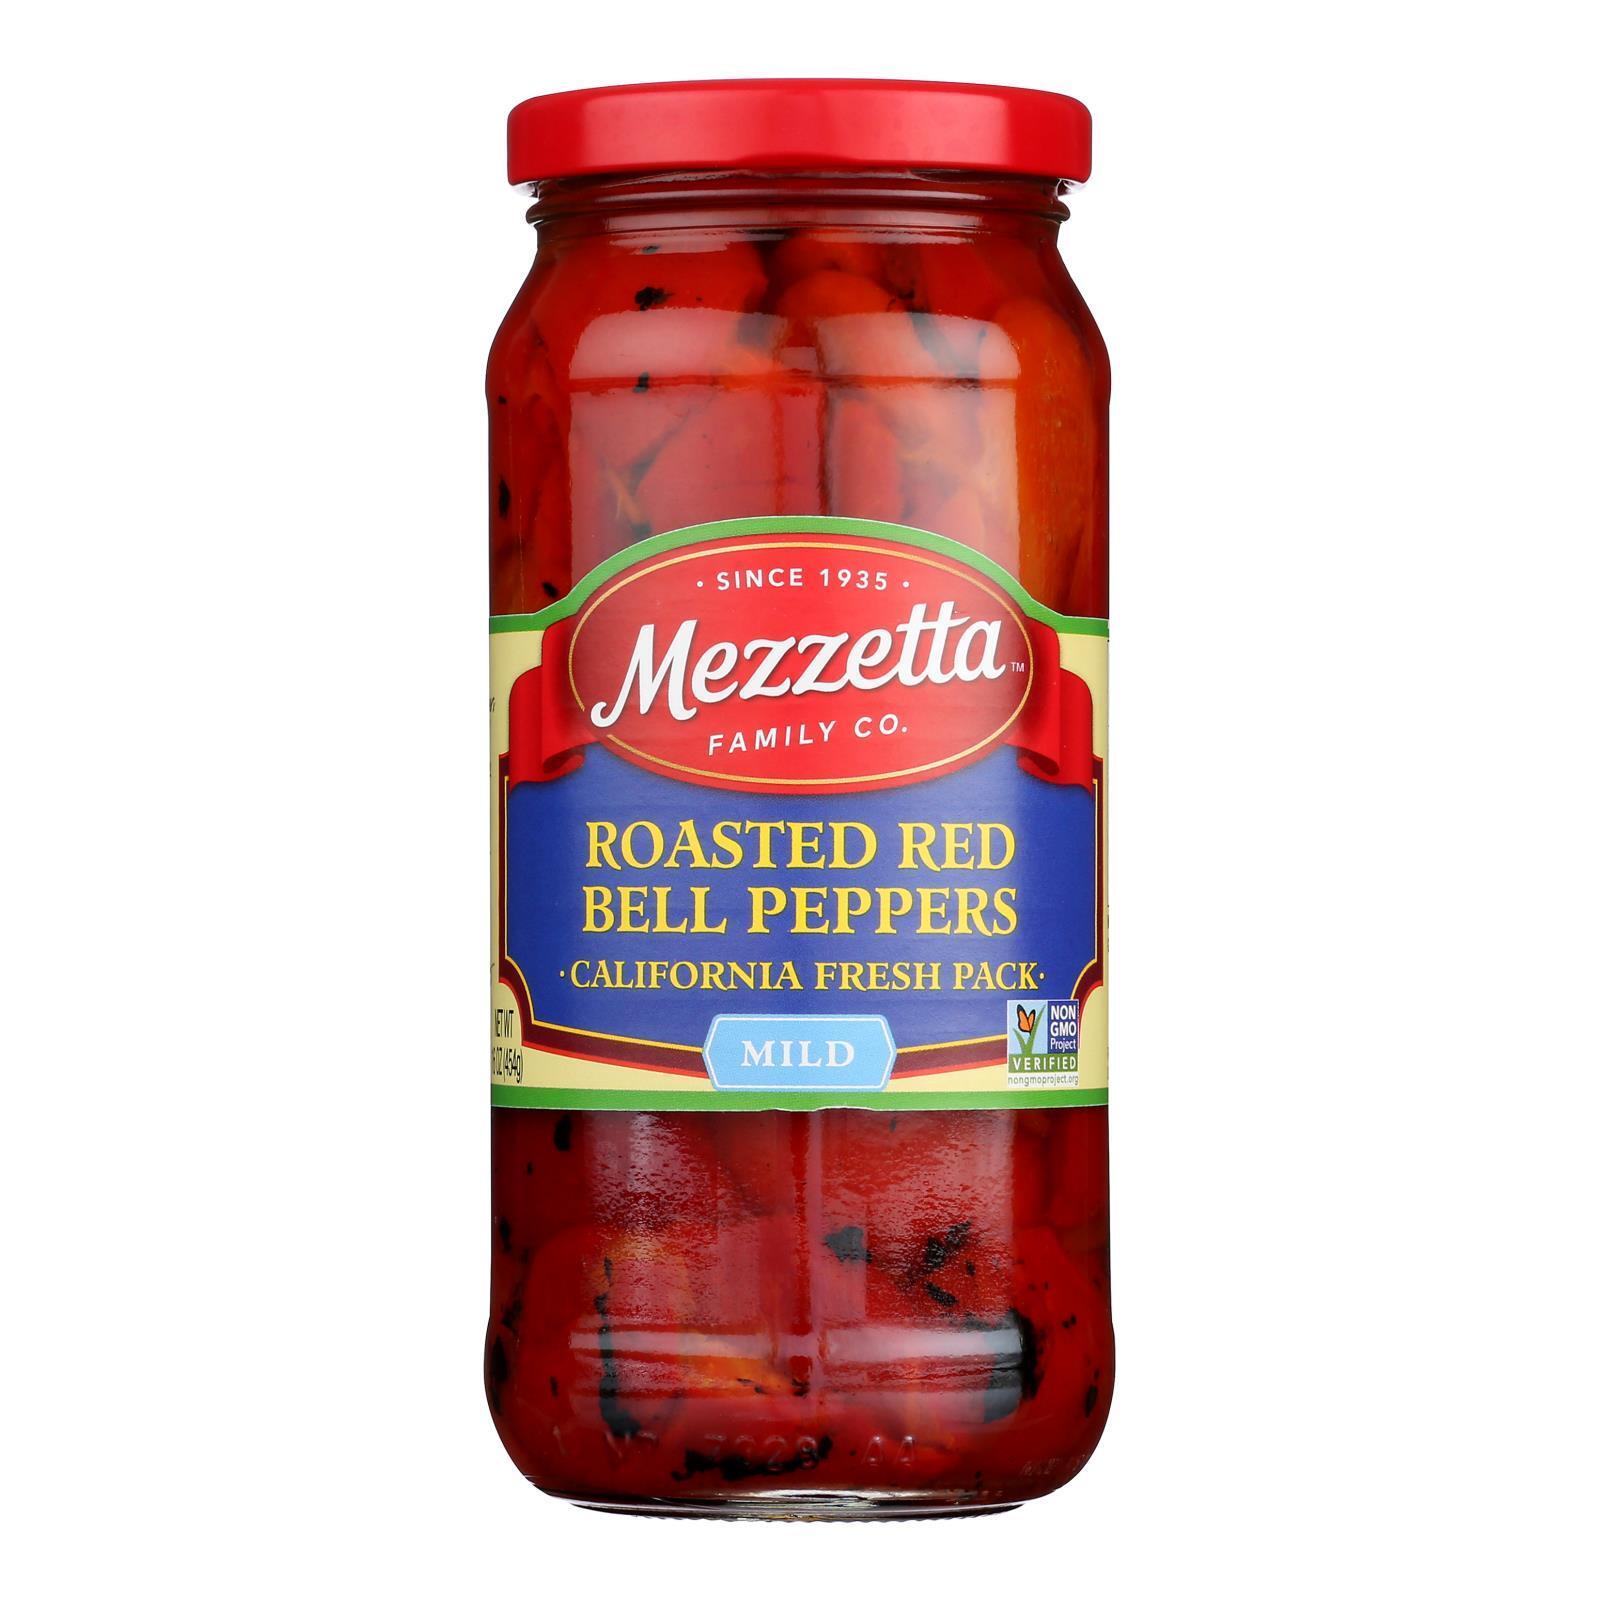 Mezzetta Roasted Bell Peppers - Case of 6 - 16 oz.